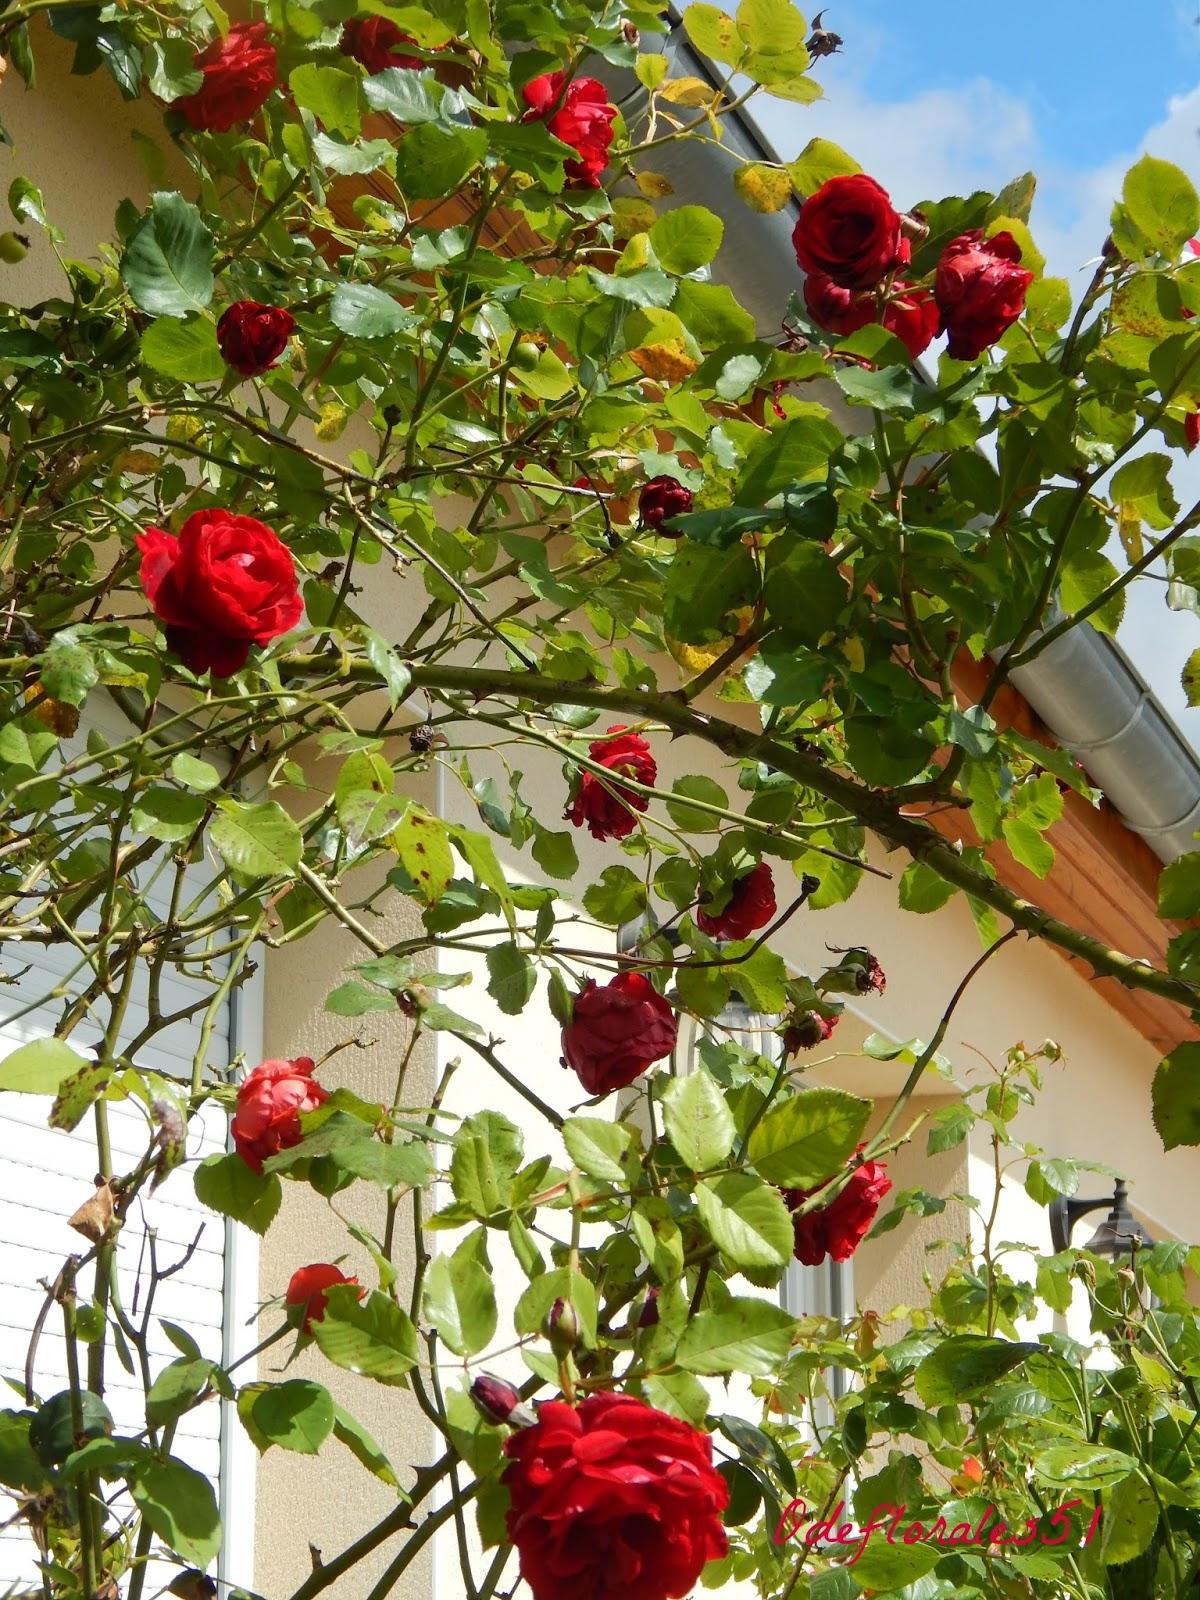 beaut s florales rosier papa meilland. Black Bedroom Furniture Sets. Home Design Ideas